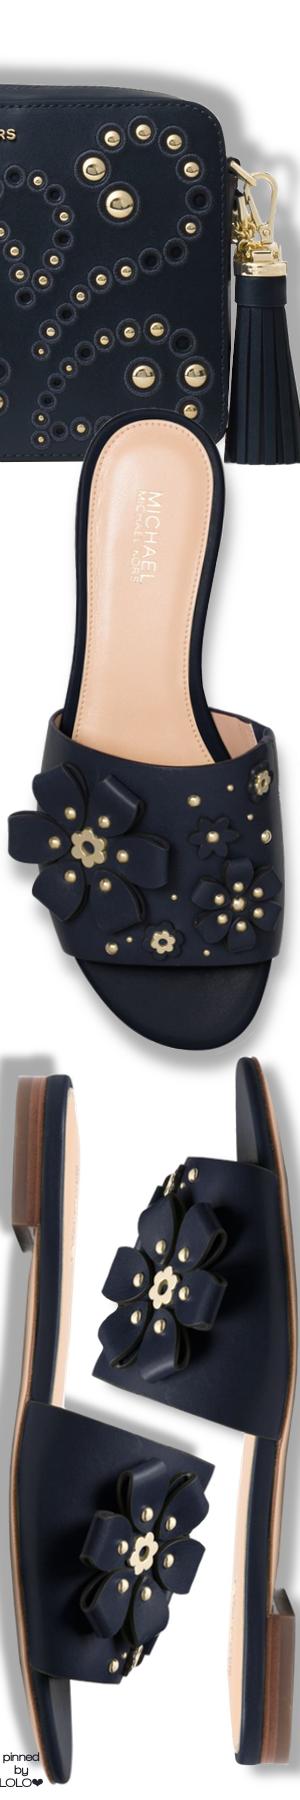 f10e128e448 MICHAEL MICHAEL KORS Tara Floral Embellished Leather Slide and Ginny Medium  Embellished Leather Crossbody